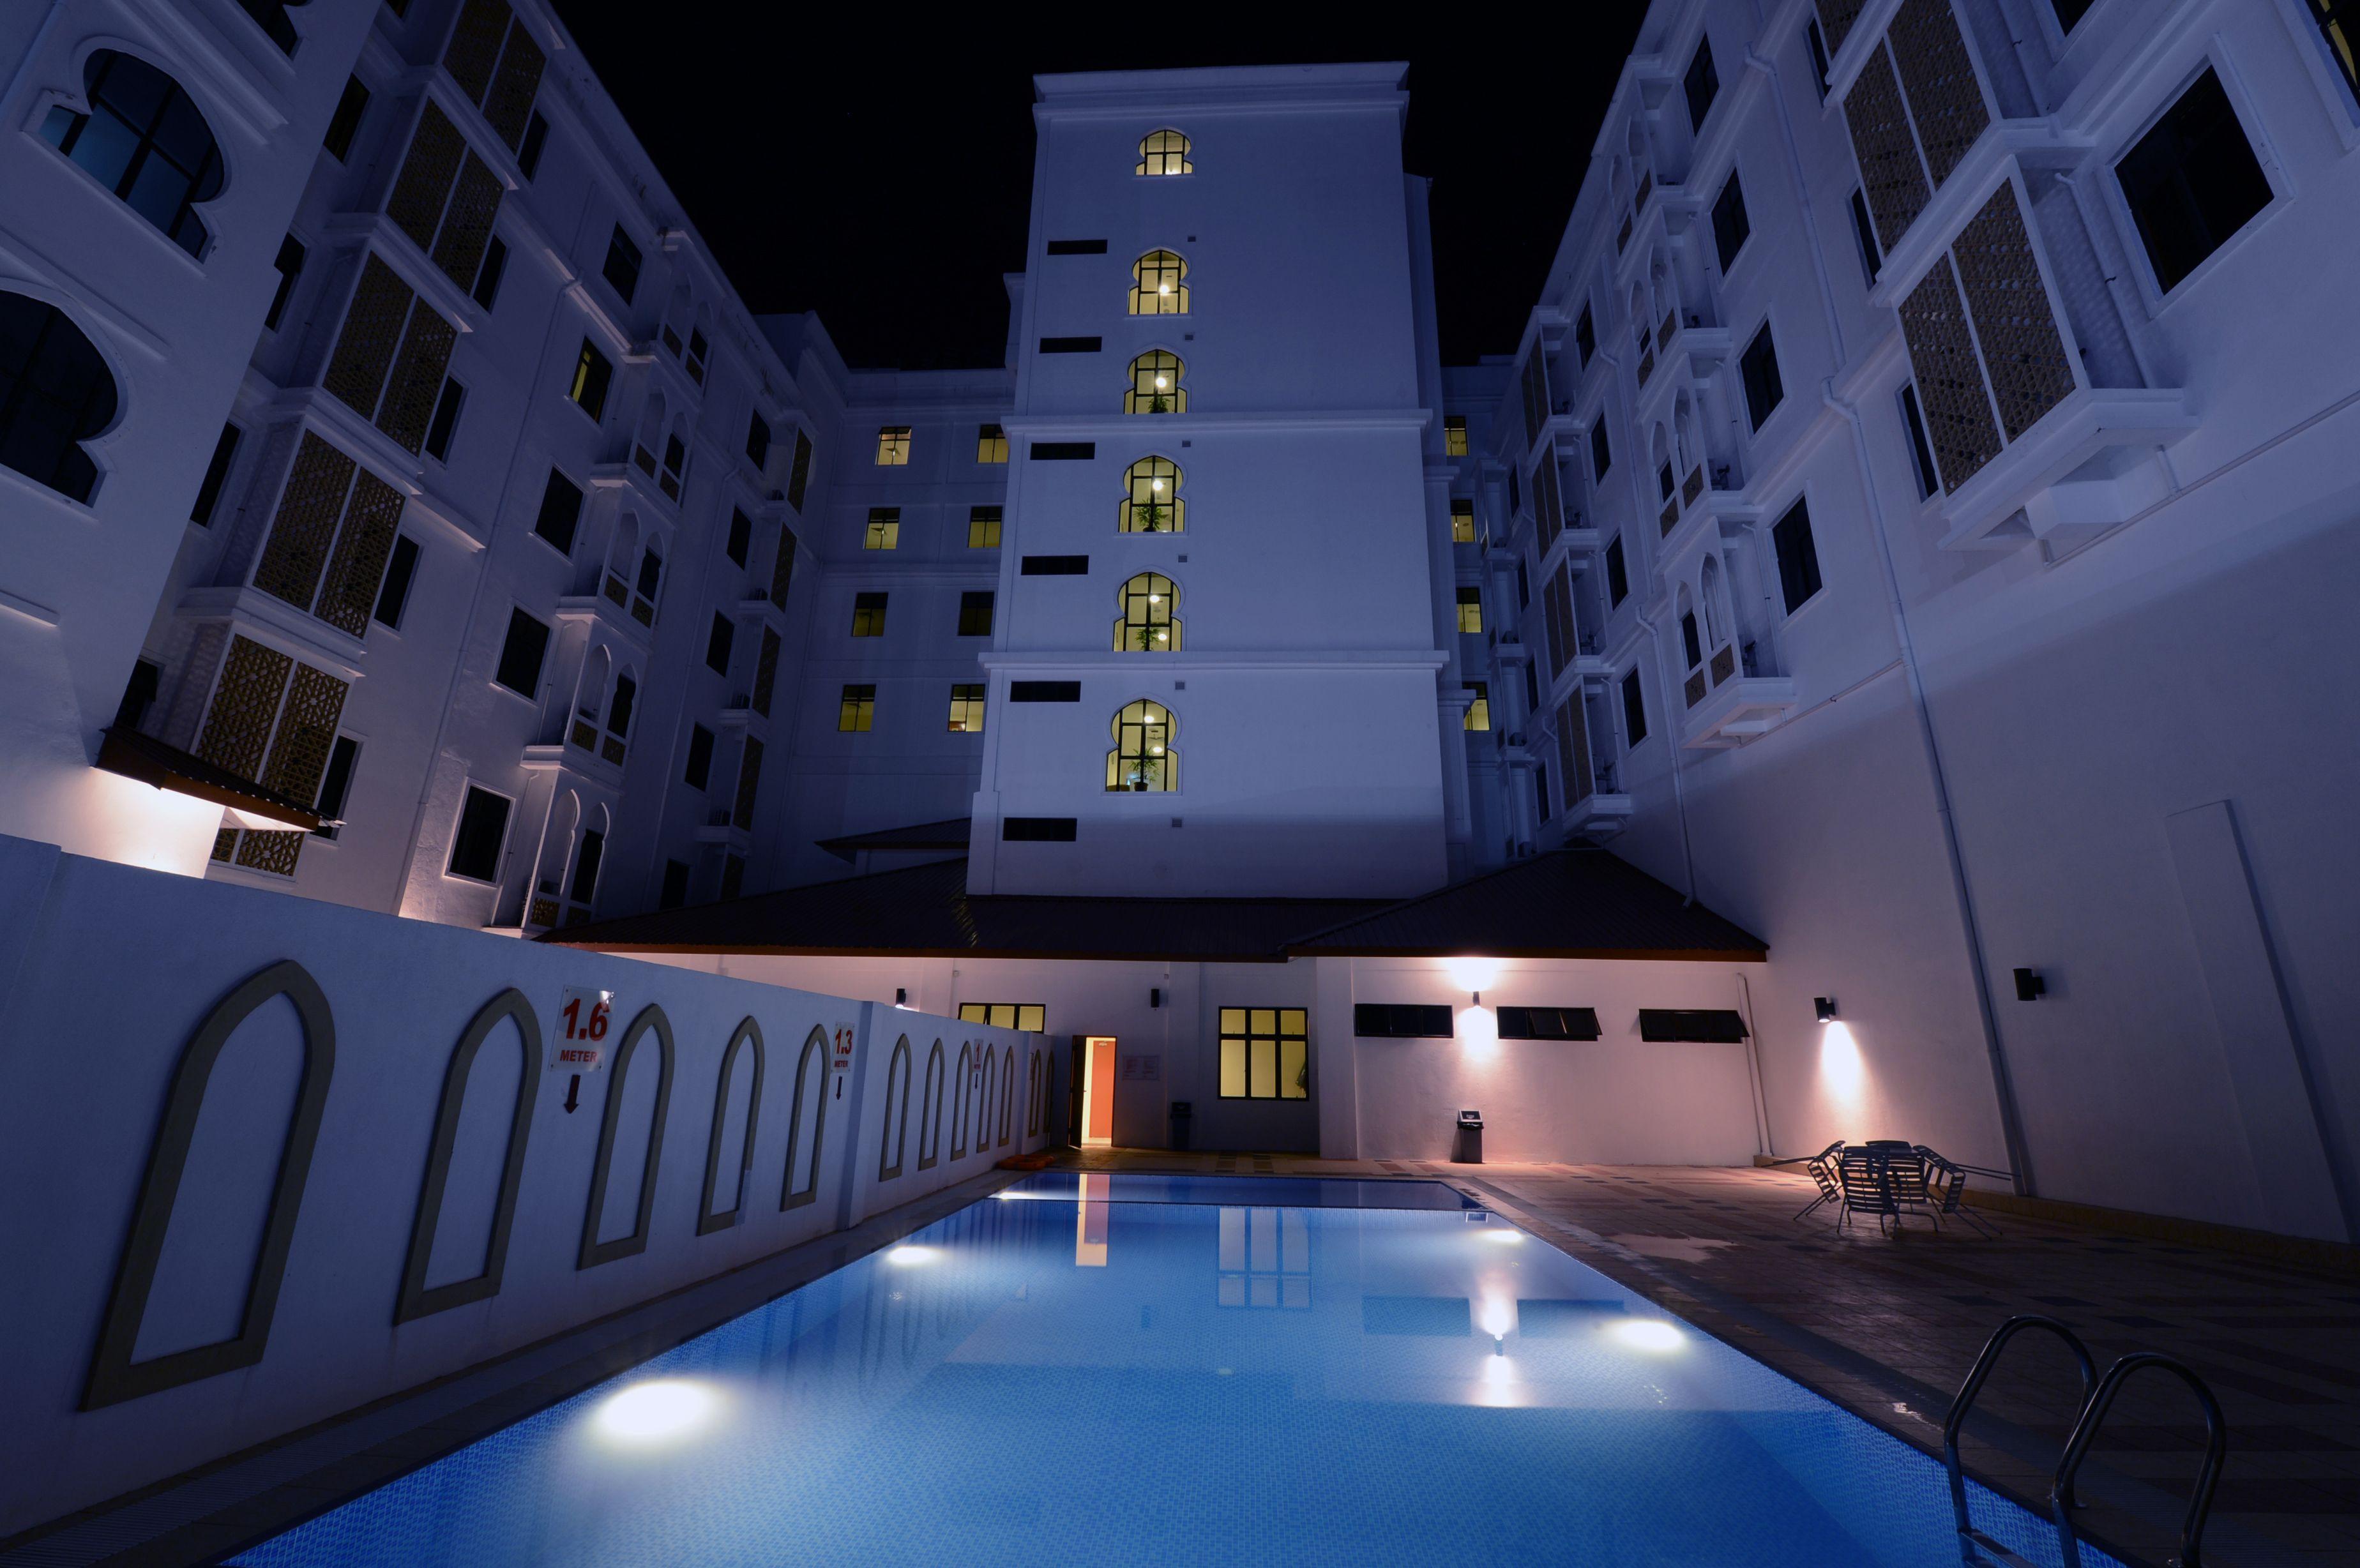 Courtesy of Grand Puteri Hotel / Expedia